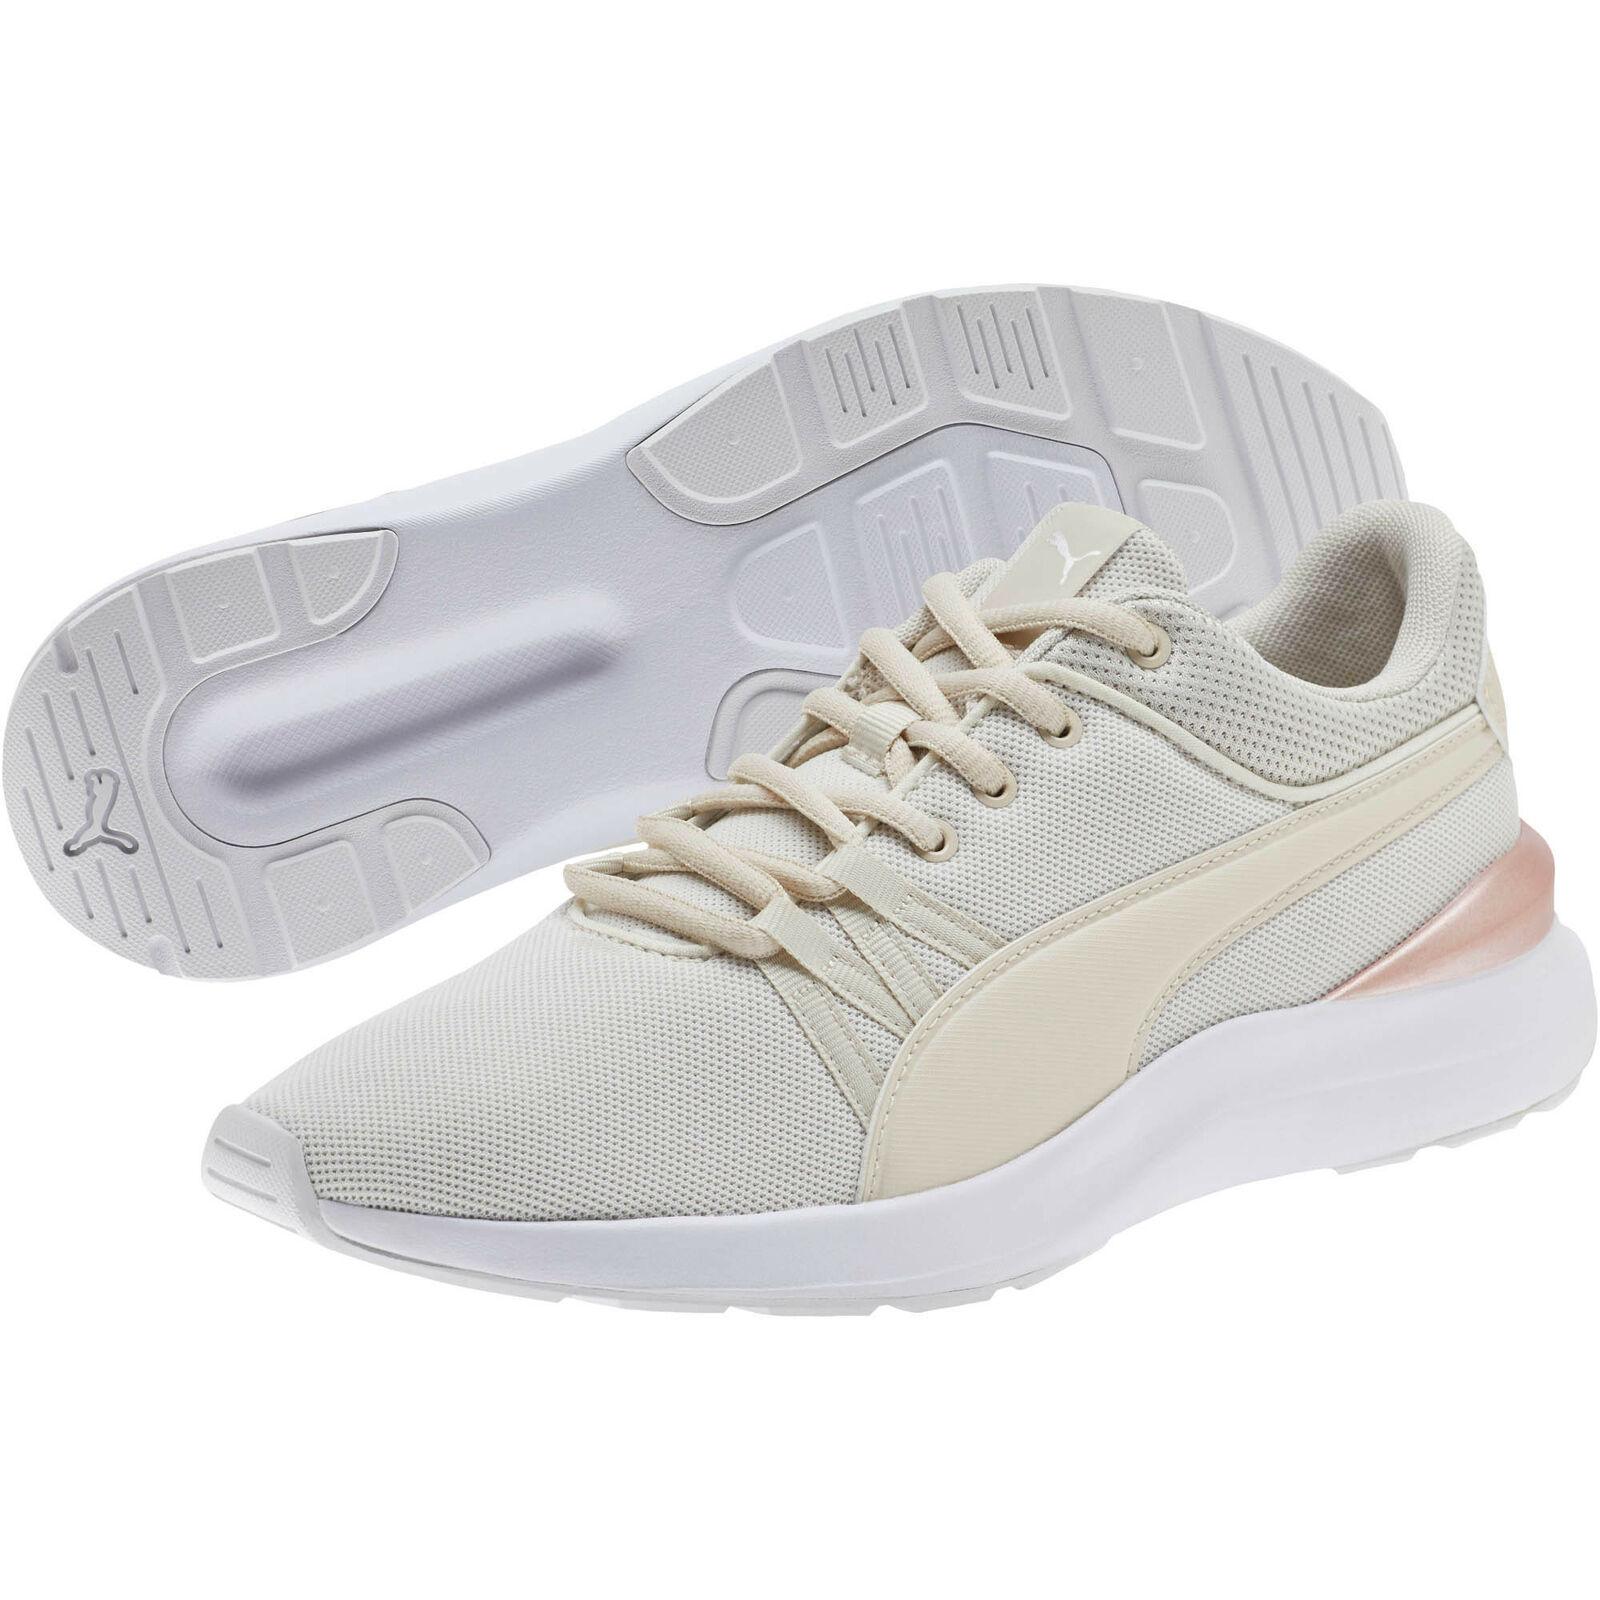 PUMA Adela Mesh Women's Sneakers Women Shoe Basics